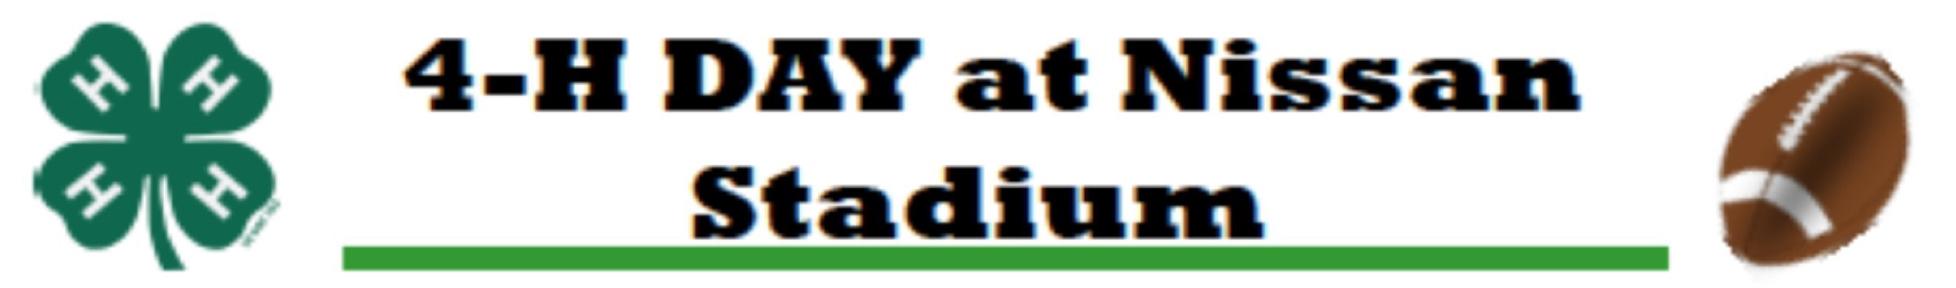 Nissan Stadium 4-H Day